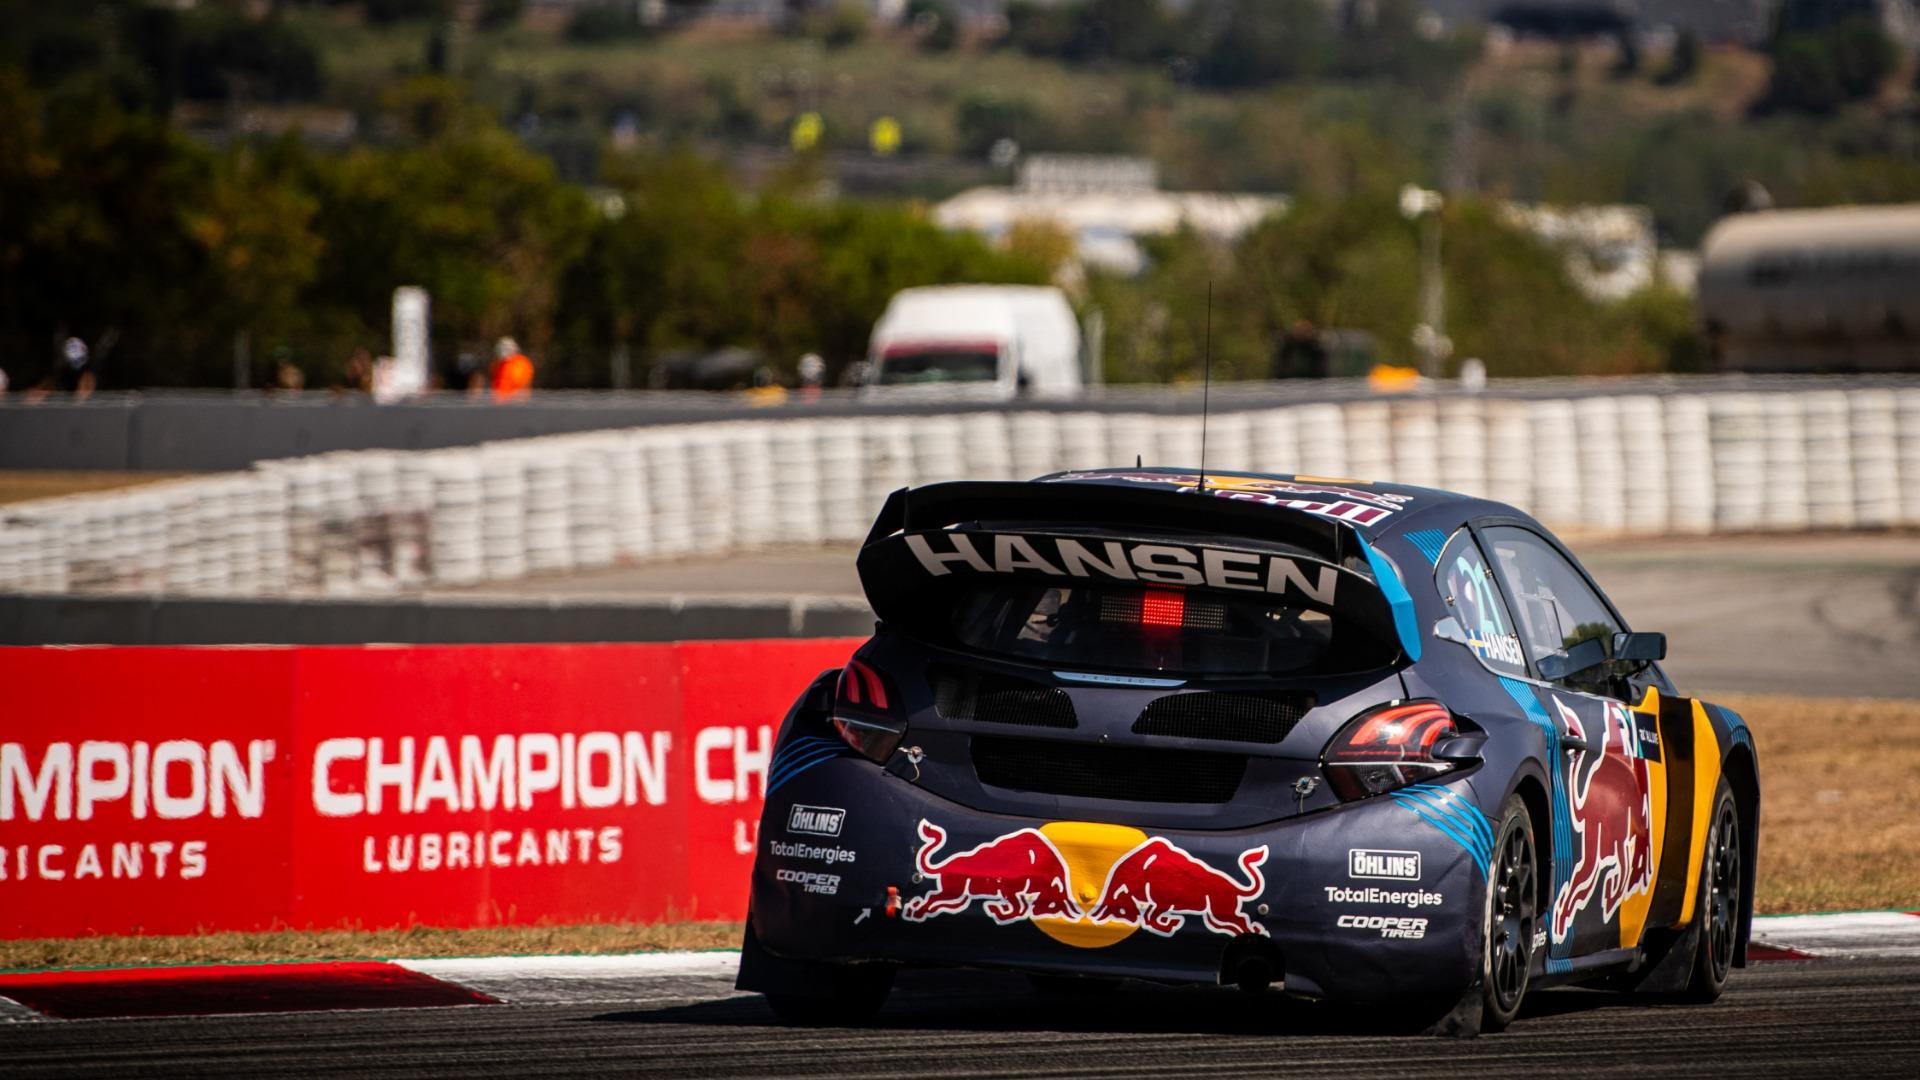 World RX of Catalunya 2021: World RX Semi Final